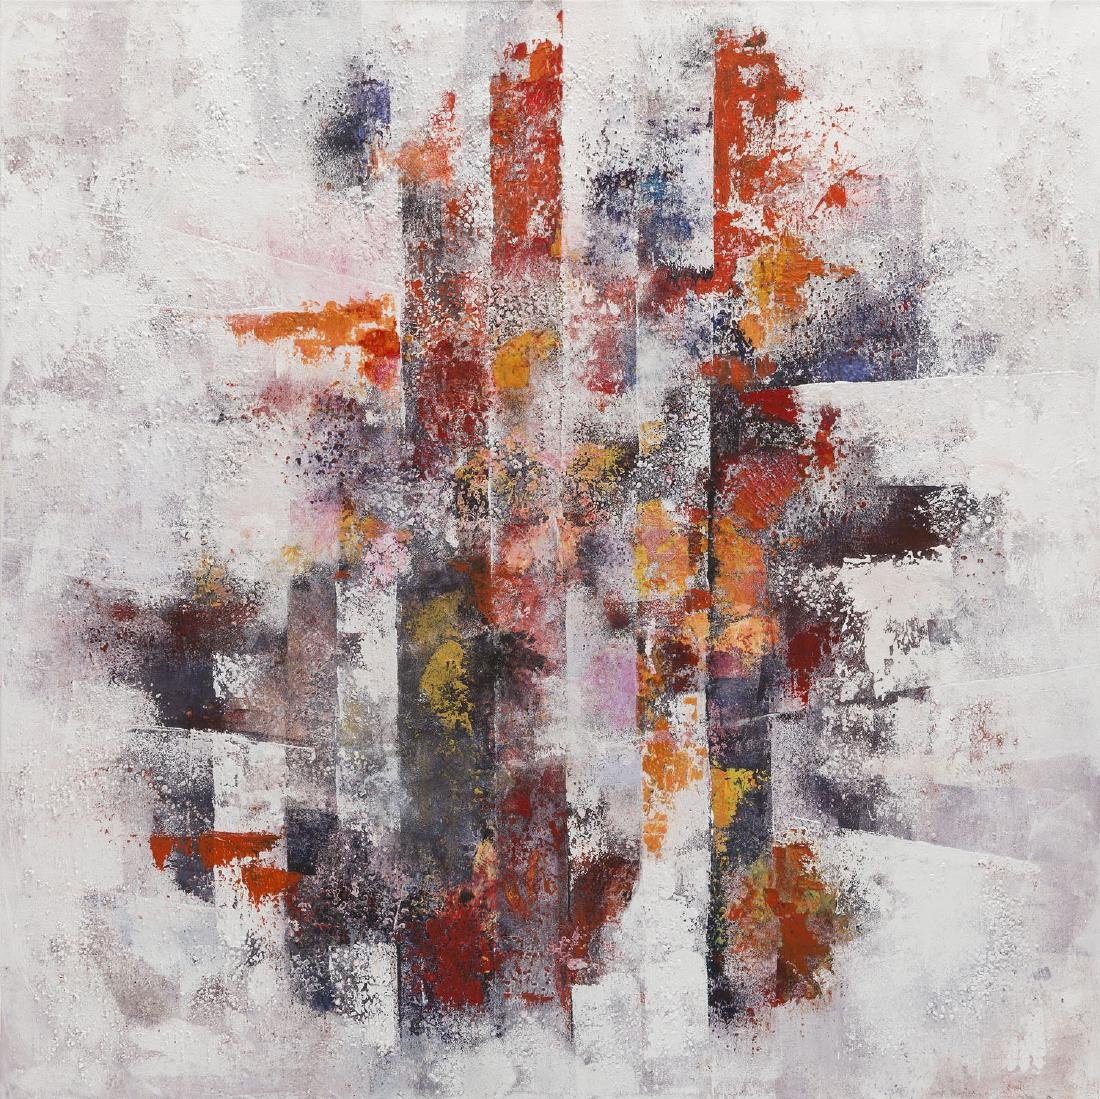 Maria Szeszula (b. 1986) Composition nr 15, 2017